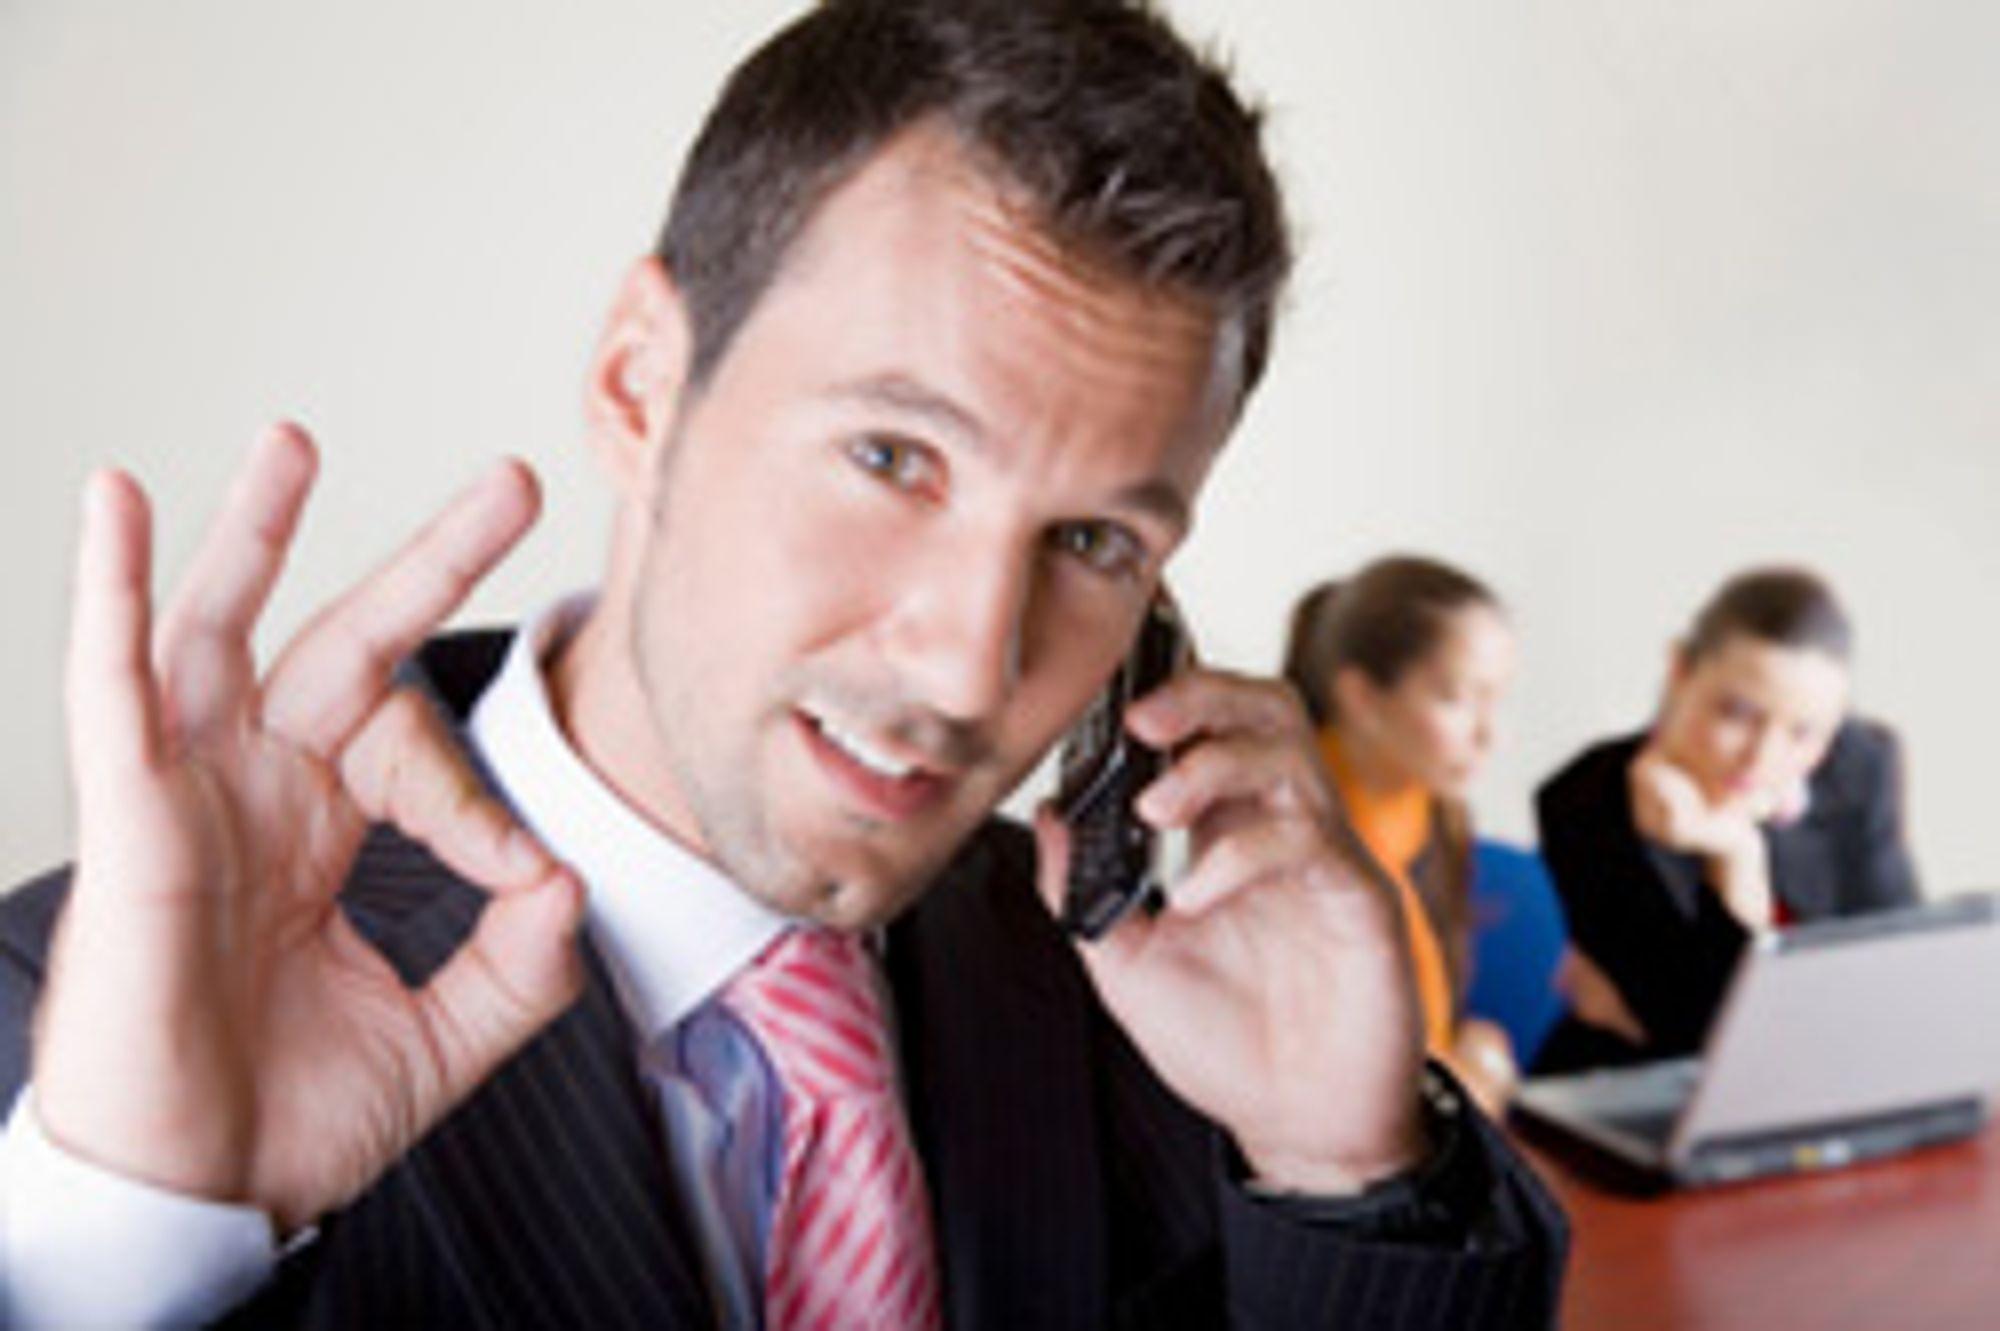 Kundene er fornøyde med Newphone. (Foto: Istockphoto / Alex Brosa)